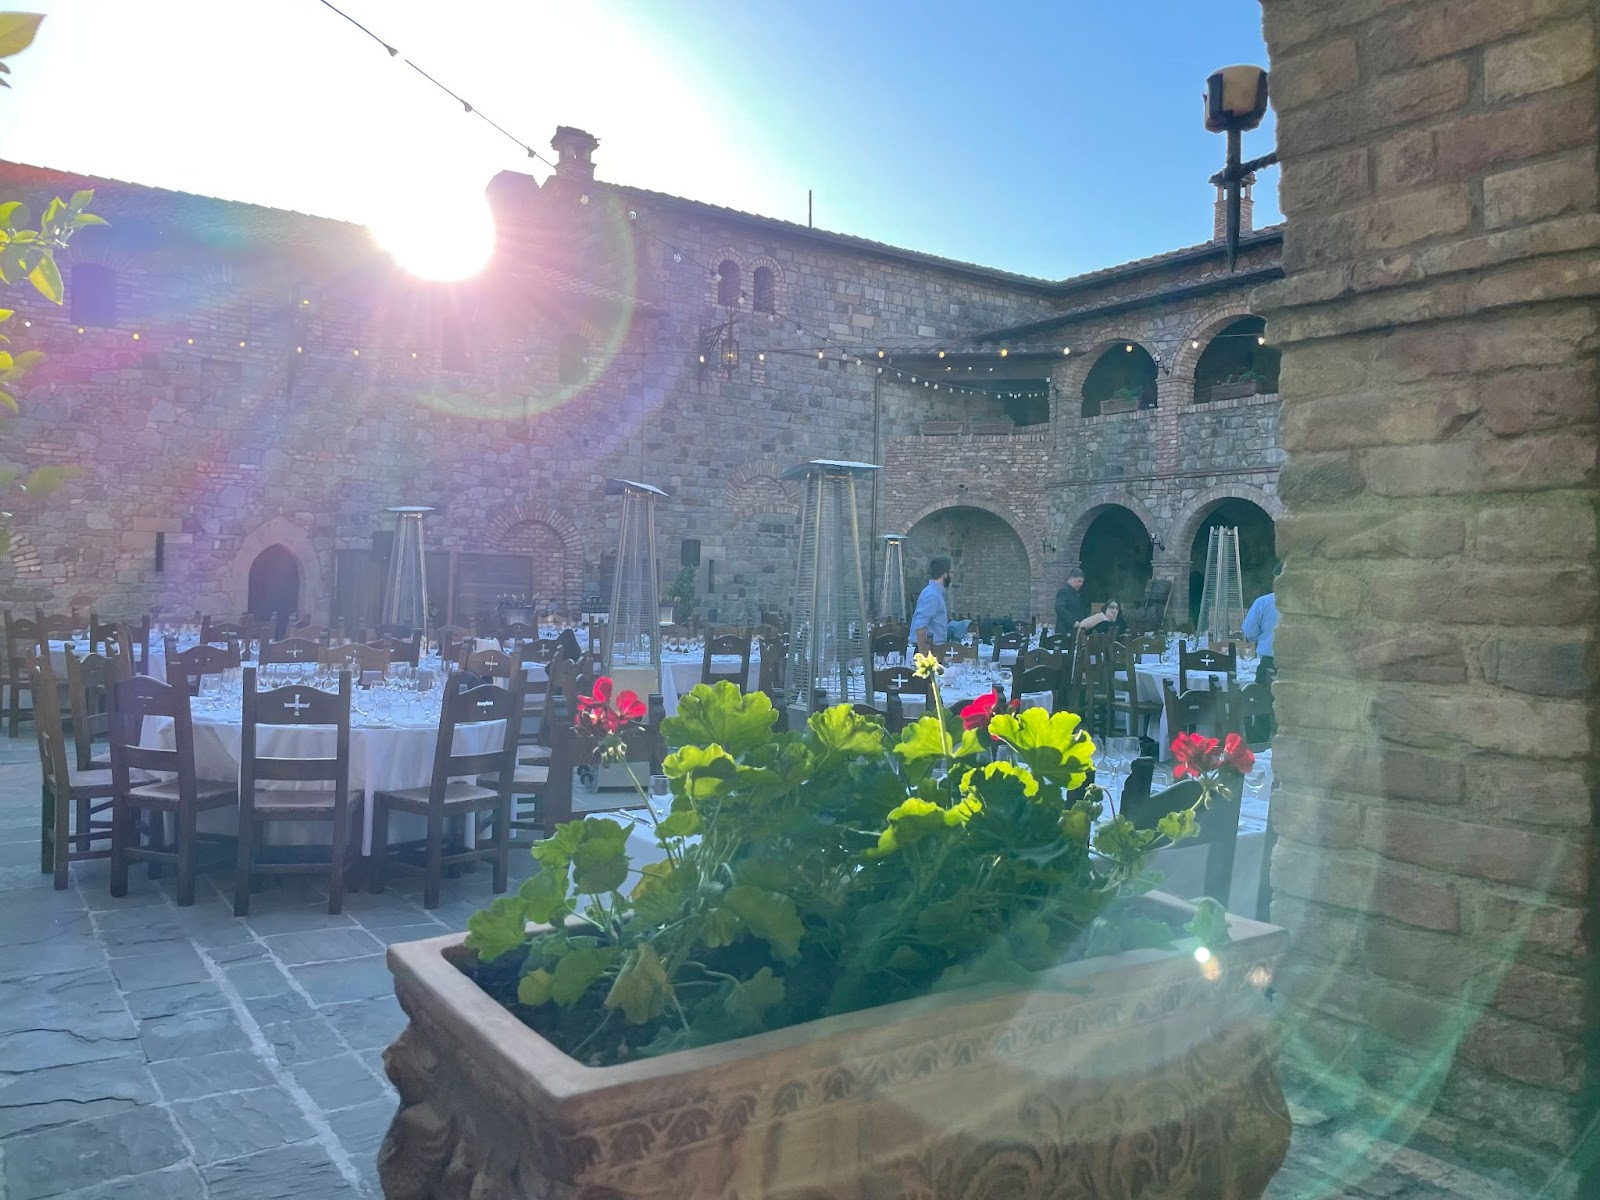 Dinner in the court of Castello di Amorosa